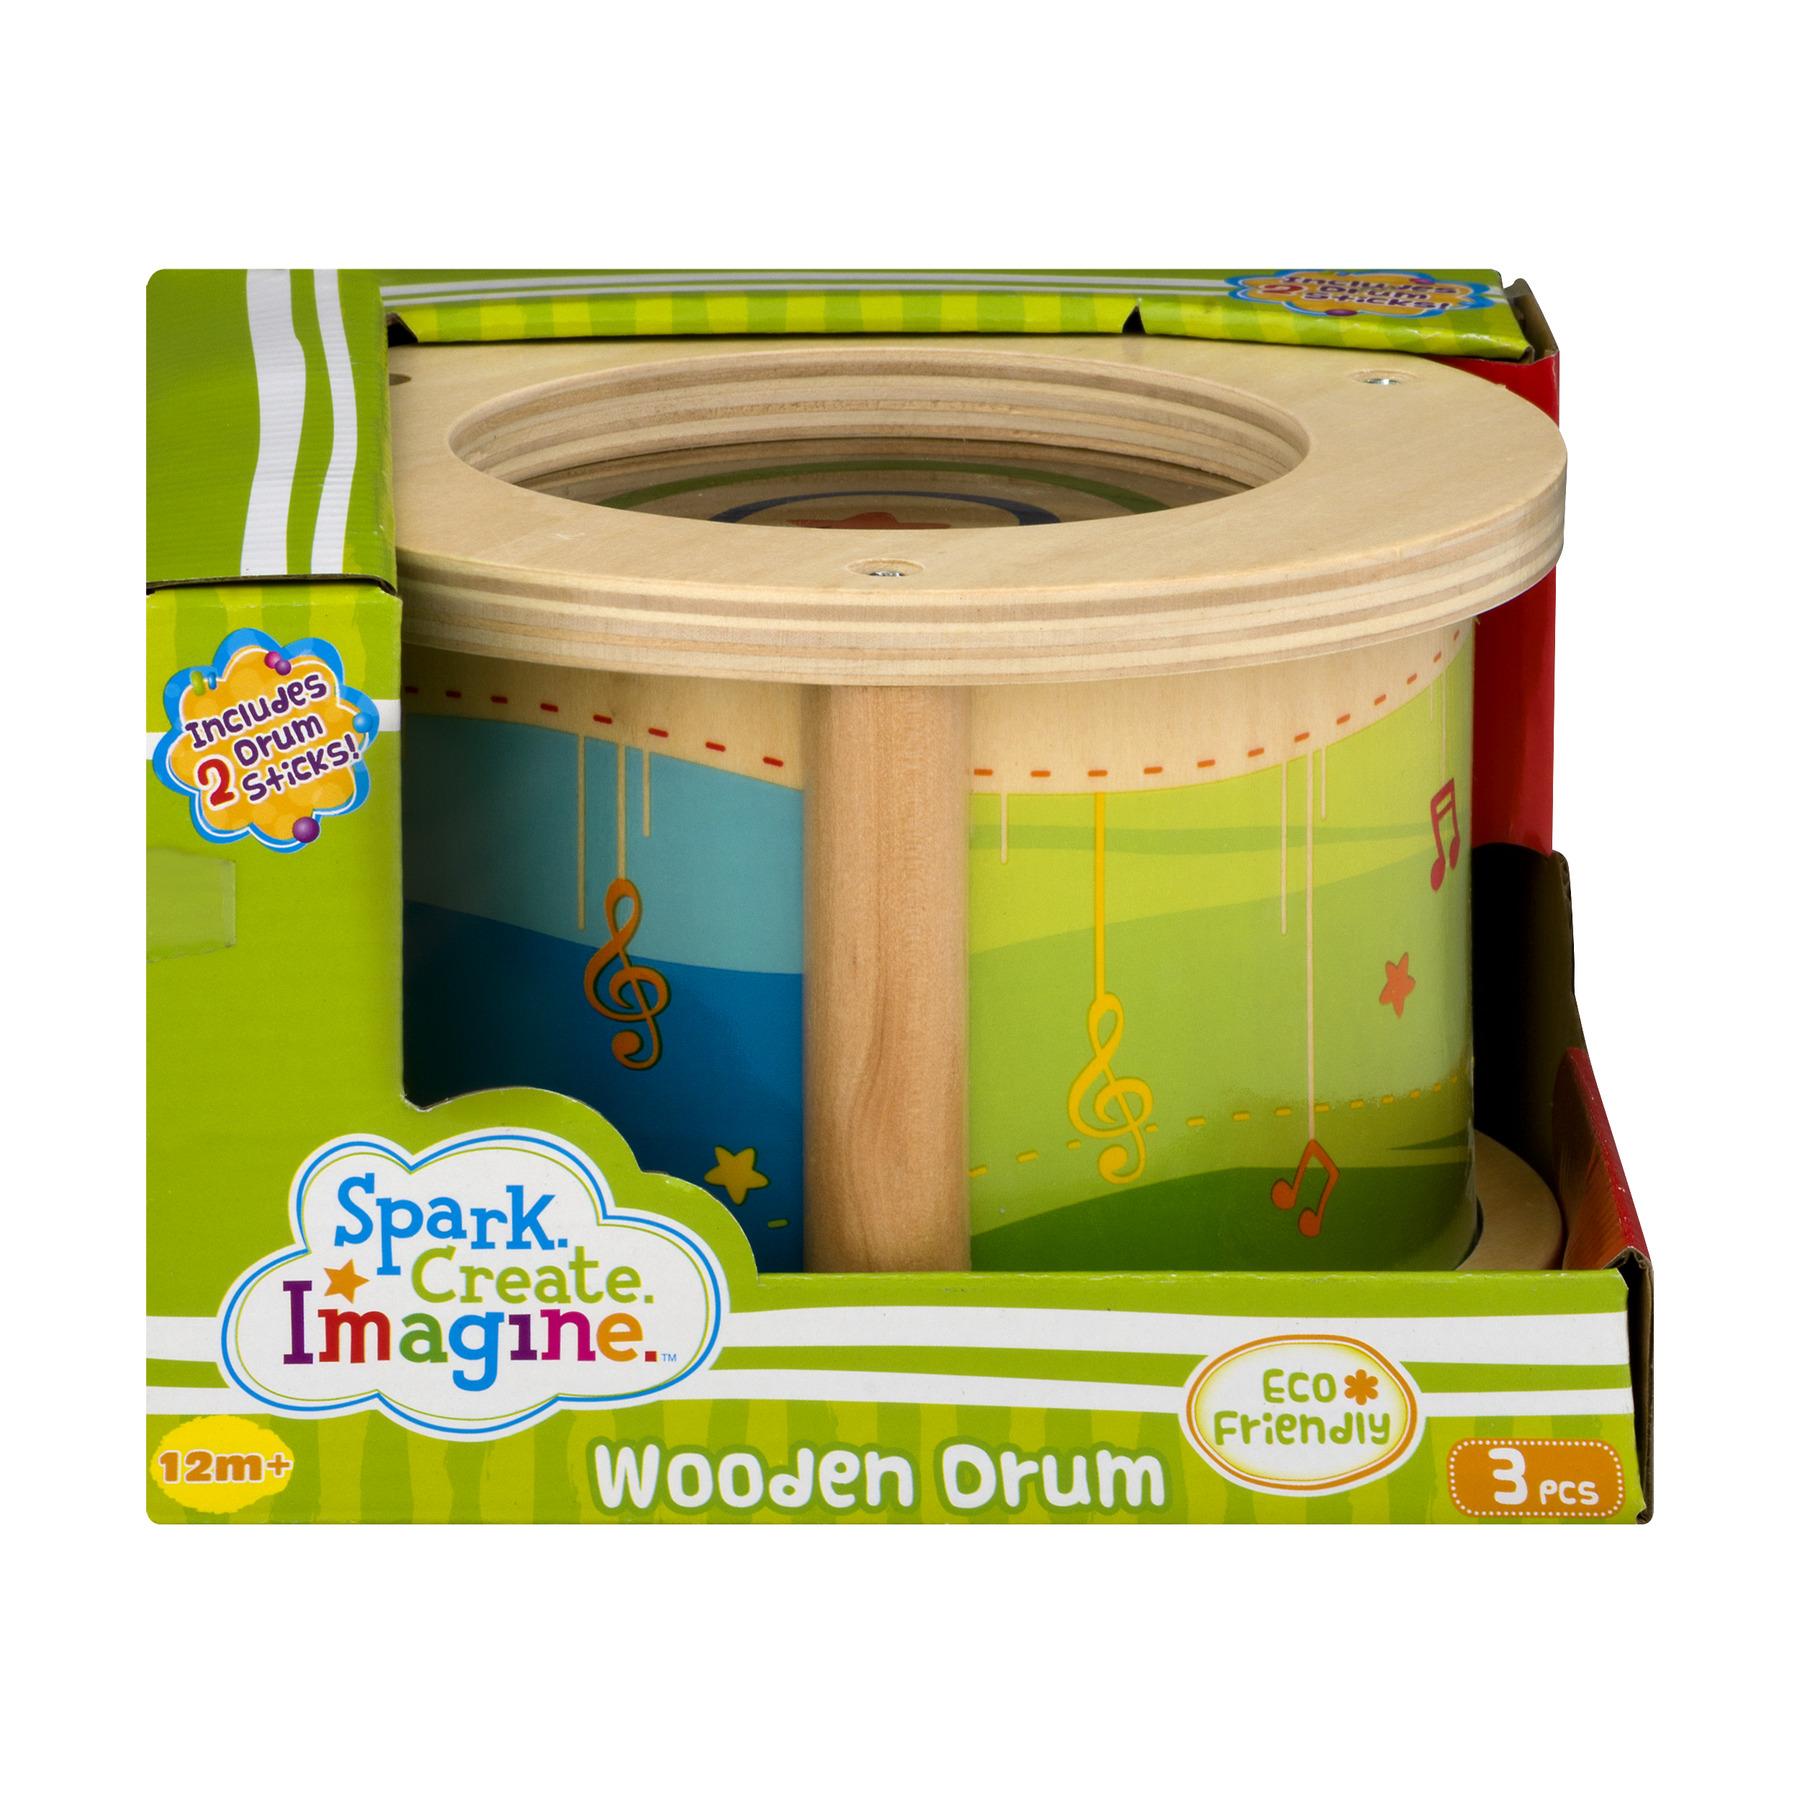 Spark Create Imagine Wooden Drum, 3.0 PIECE(S)